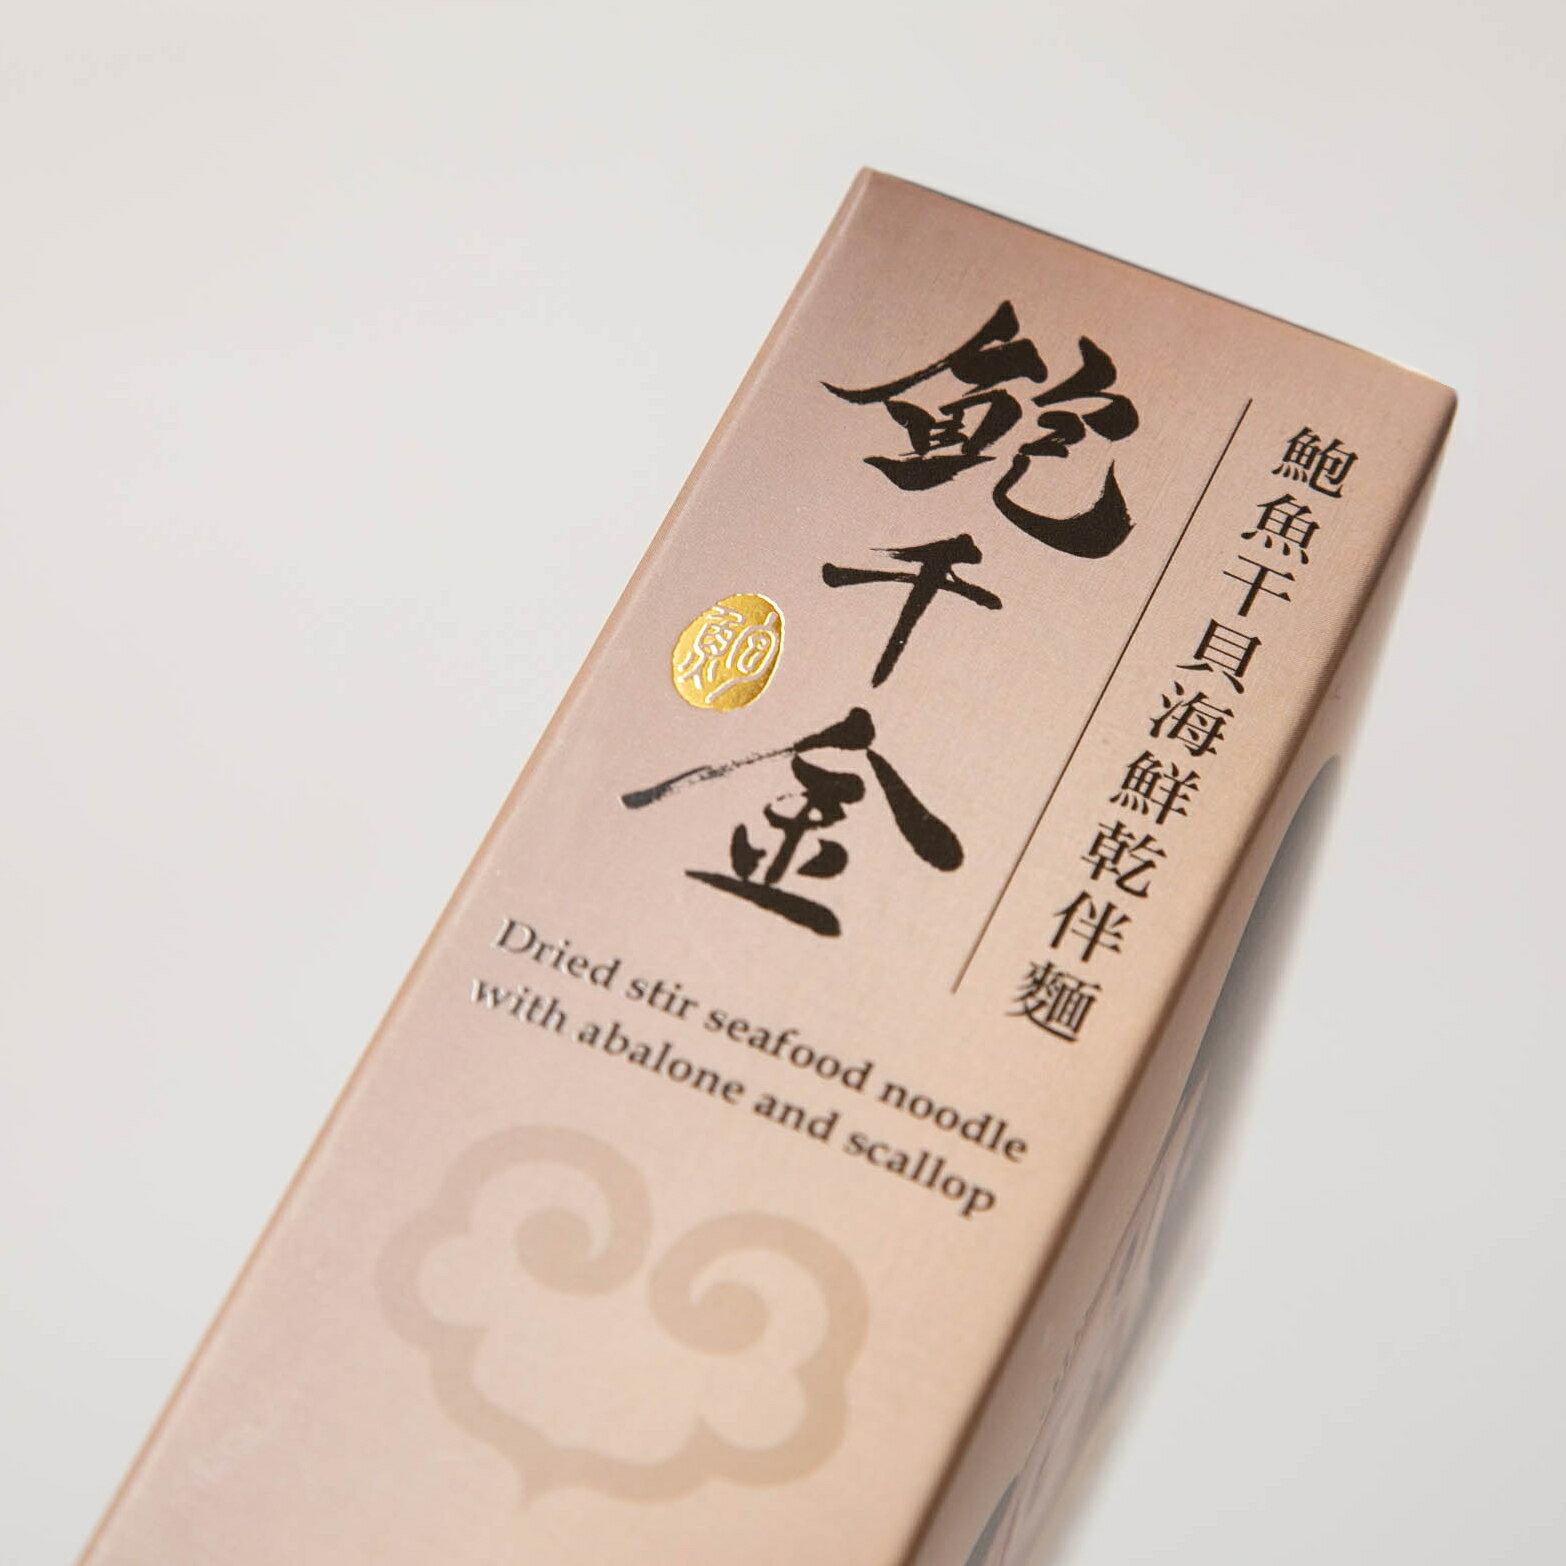 【APP滿666折50】鮑千金 鮑魚干貝海鮮乾拌麵(香辣)一箱12盒入 3